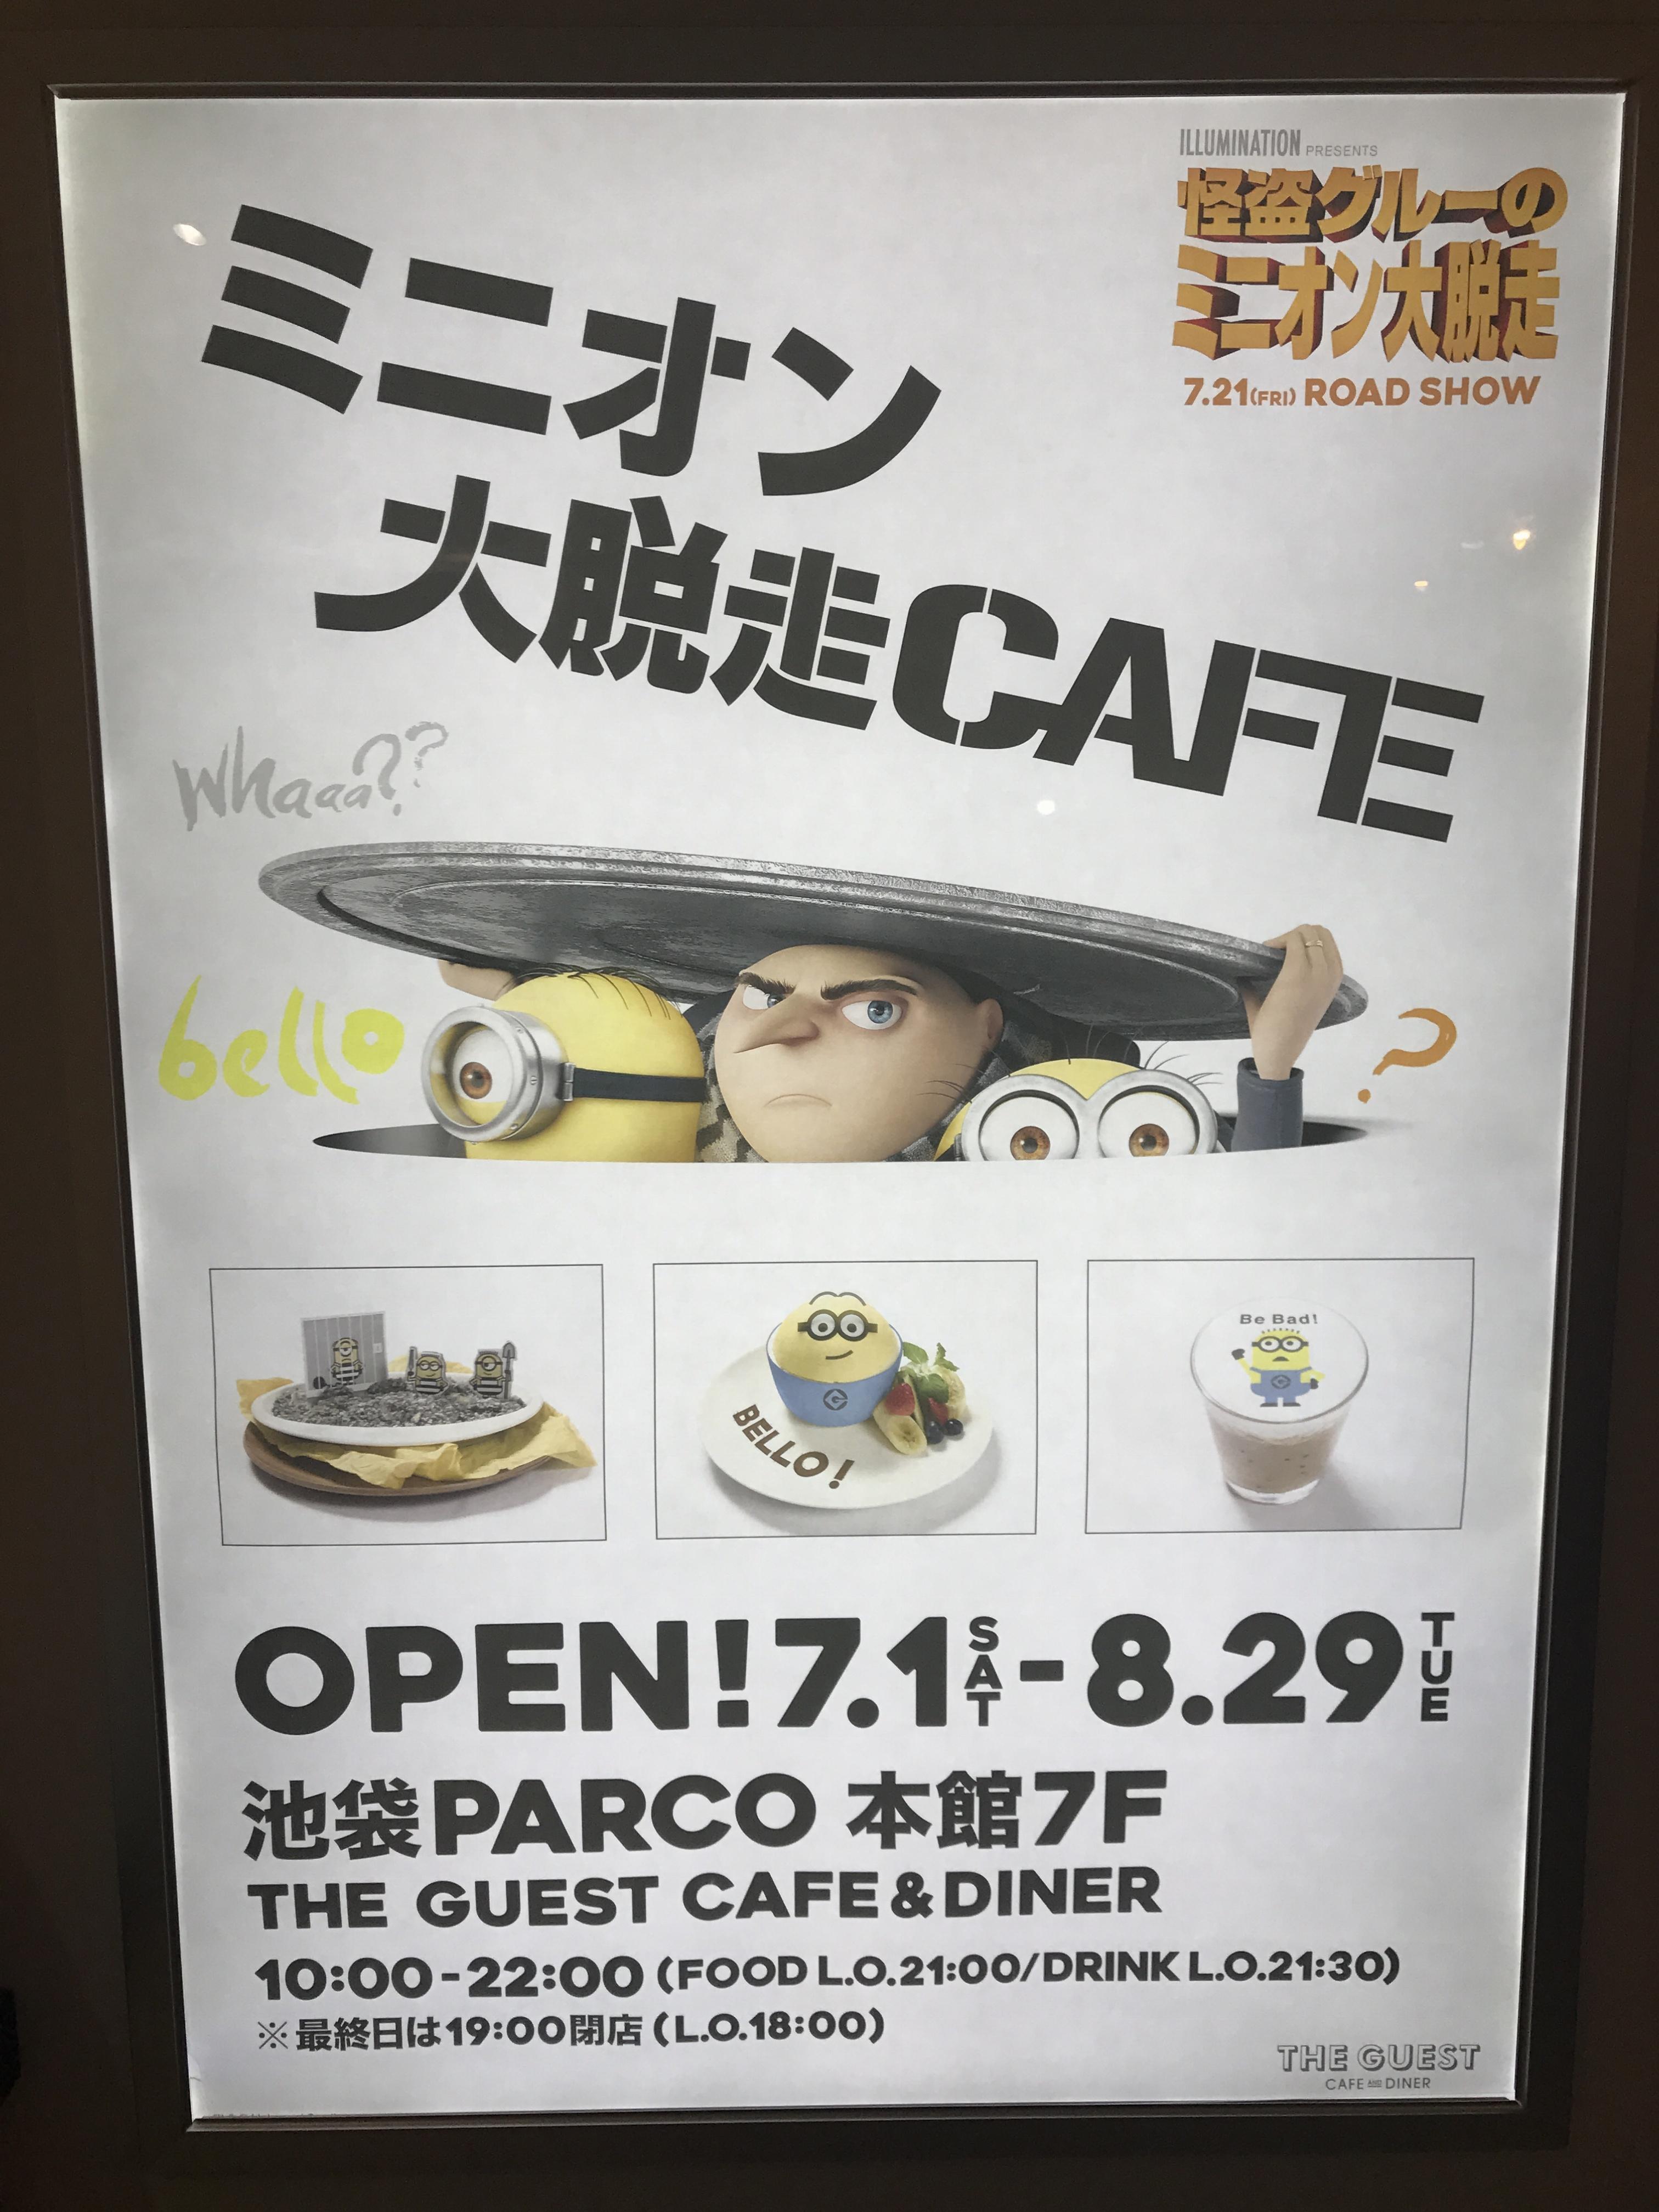 【FOOD】夏休みのおでかけに!怪盗グルーのミニオン大脱走 #ミニオンカフェ に行ってきました★_2